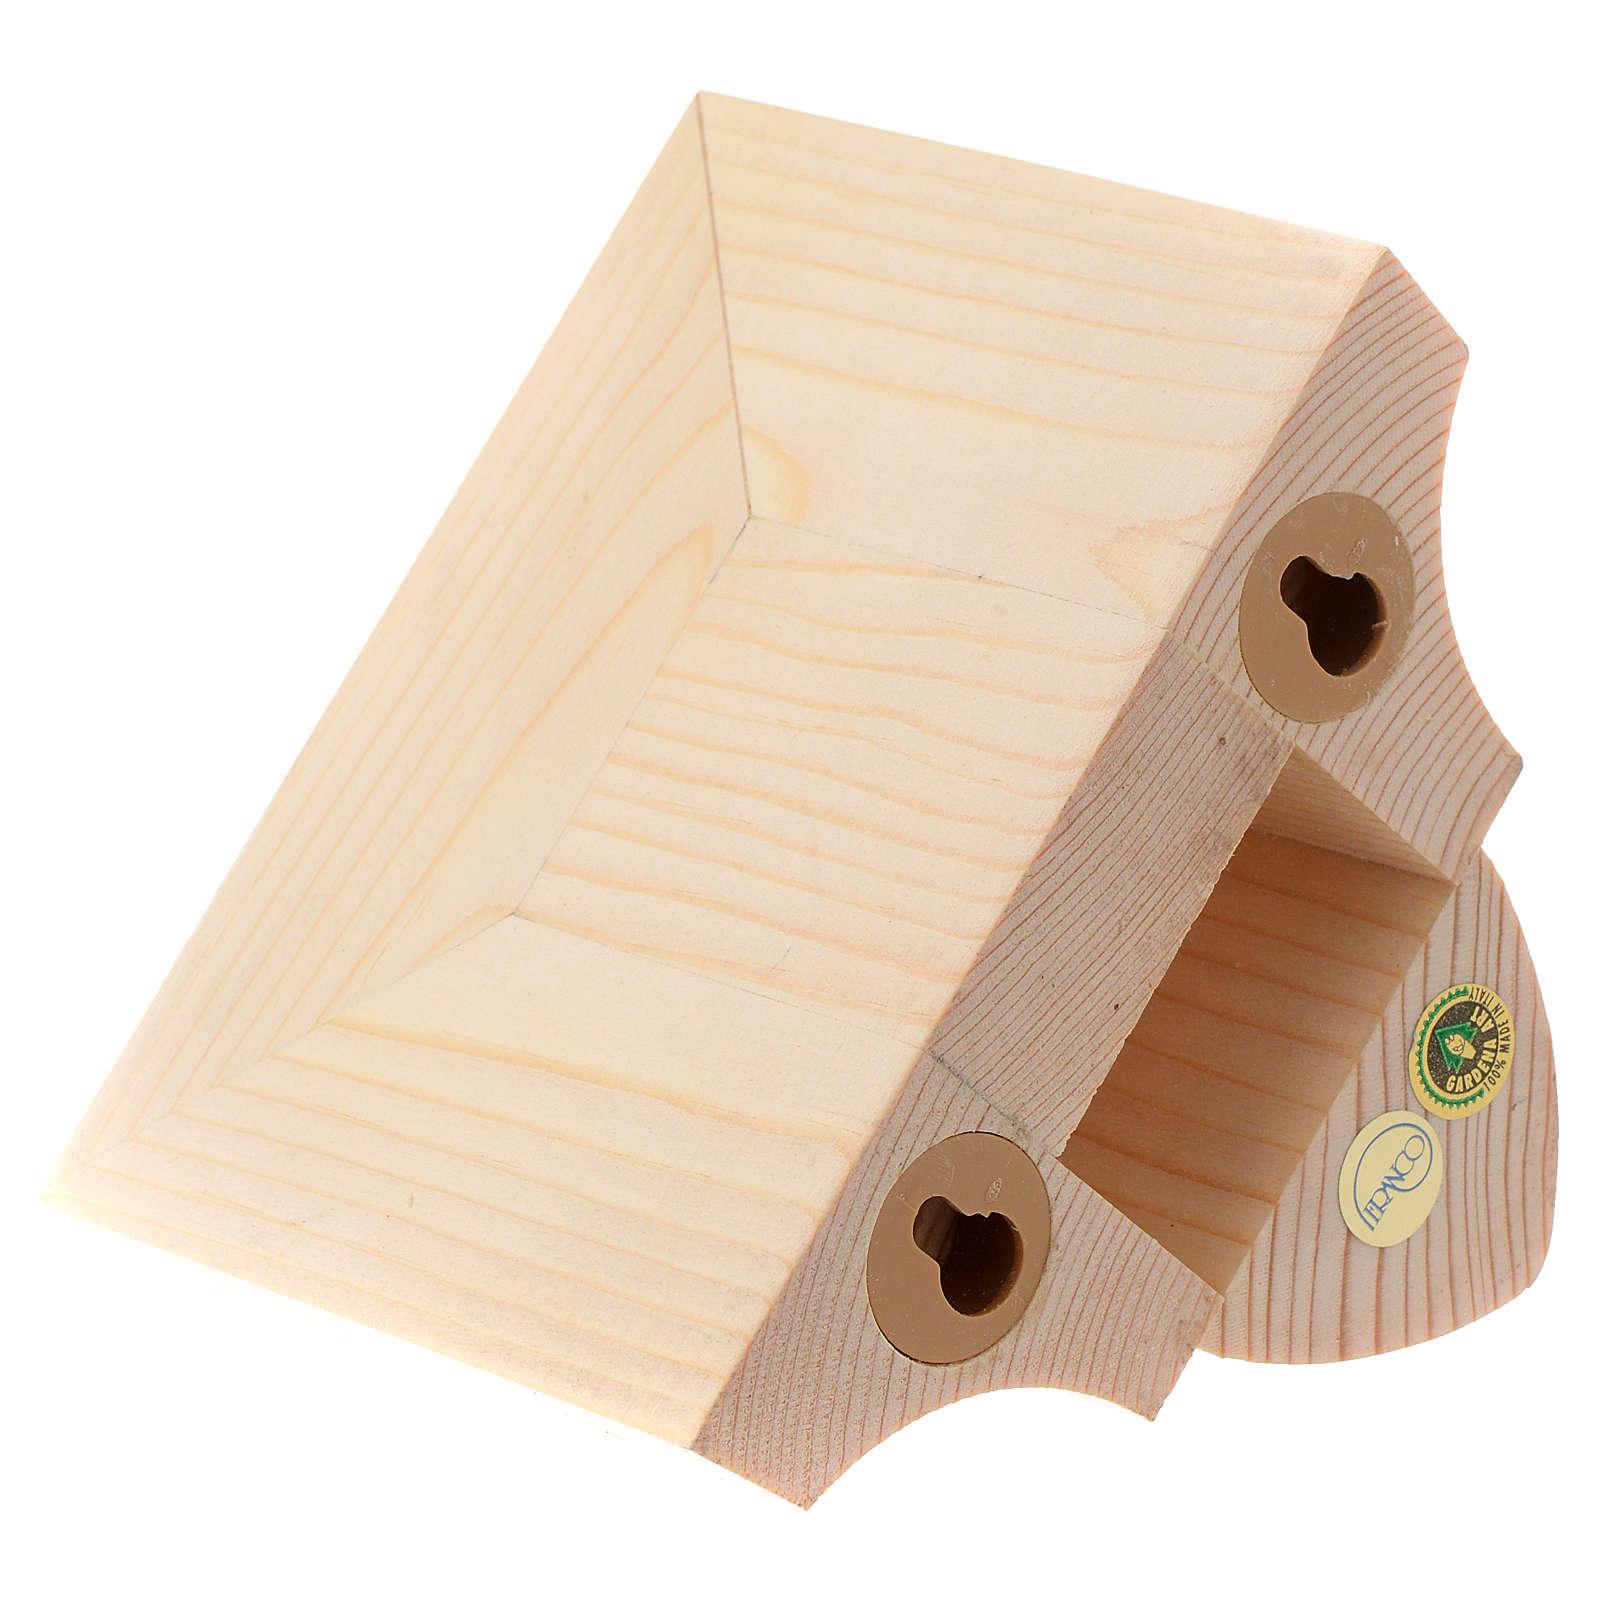 Ménsula pared para imágenes de madera natural encerada 9x11cm 4